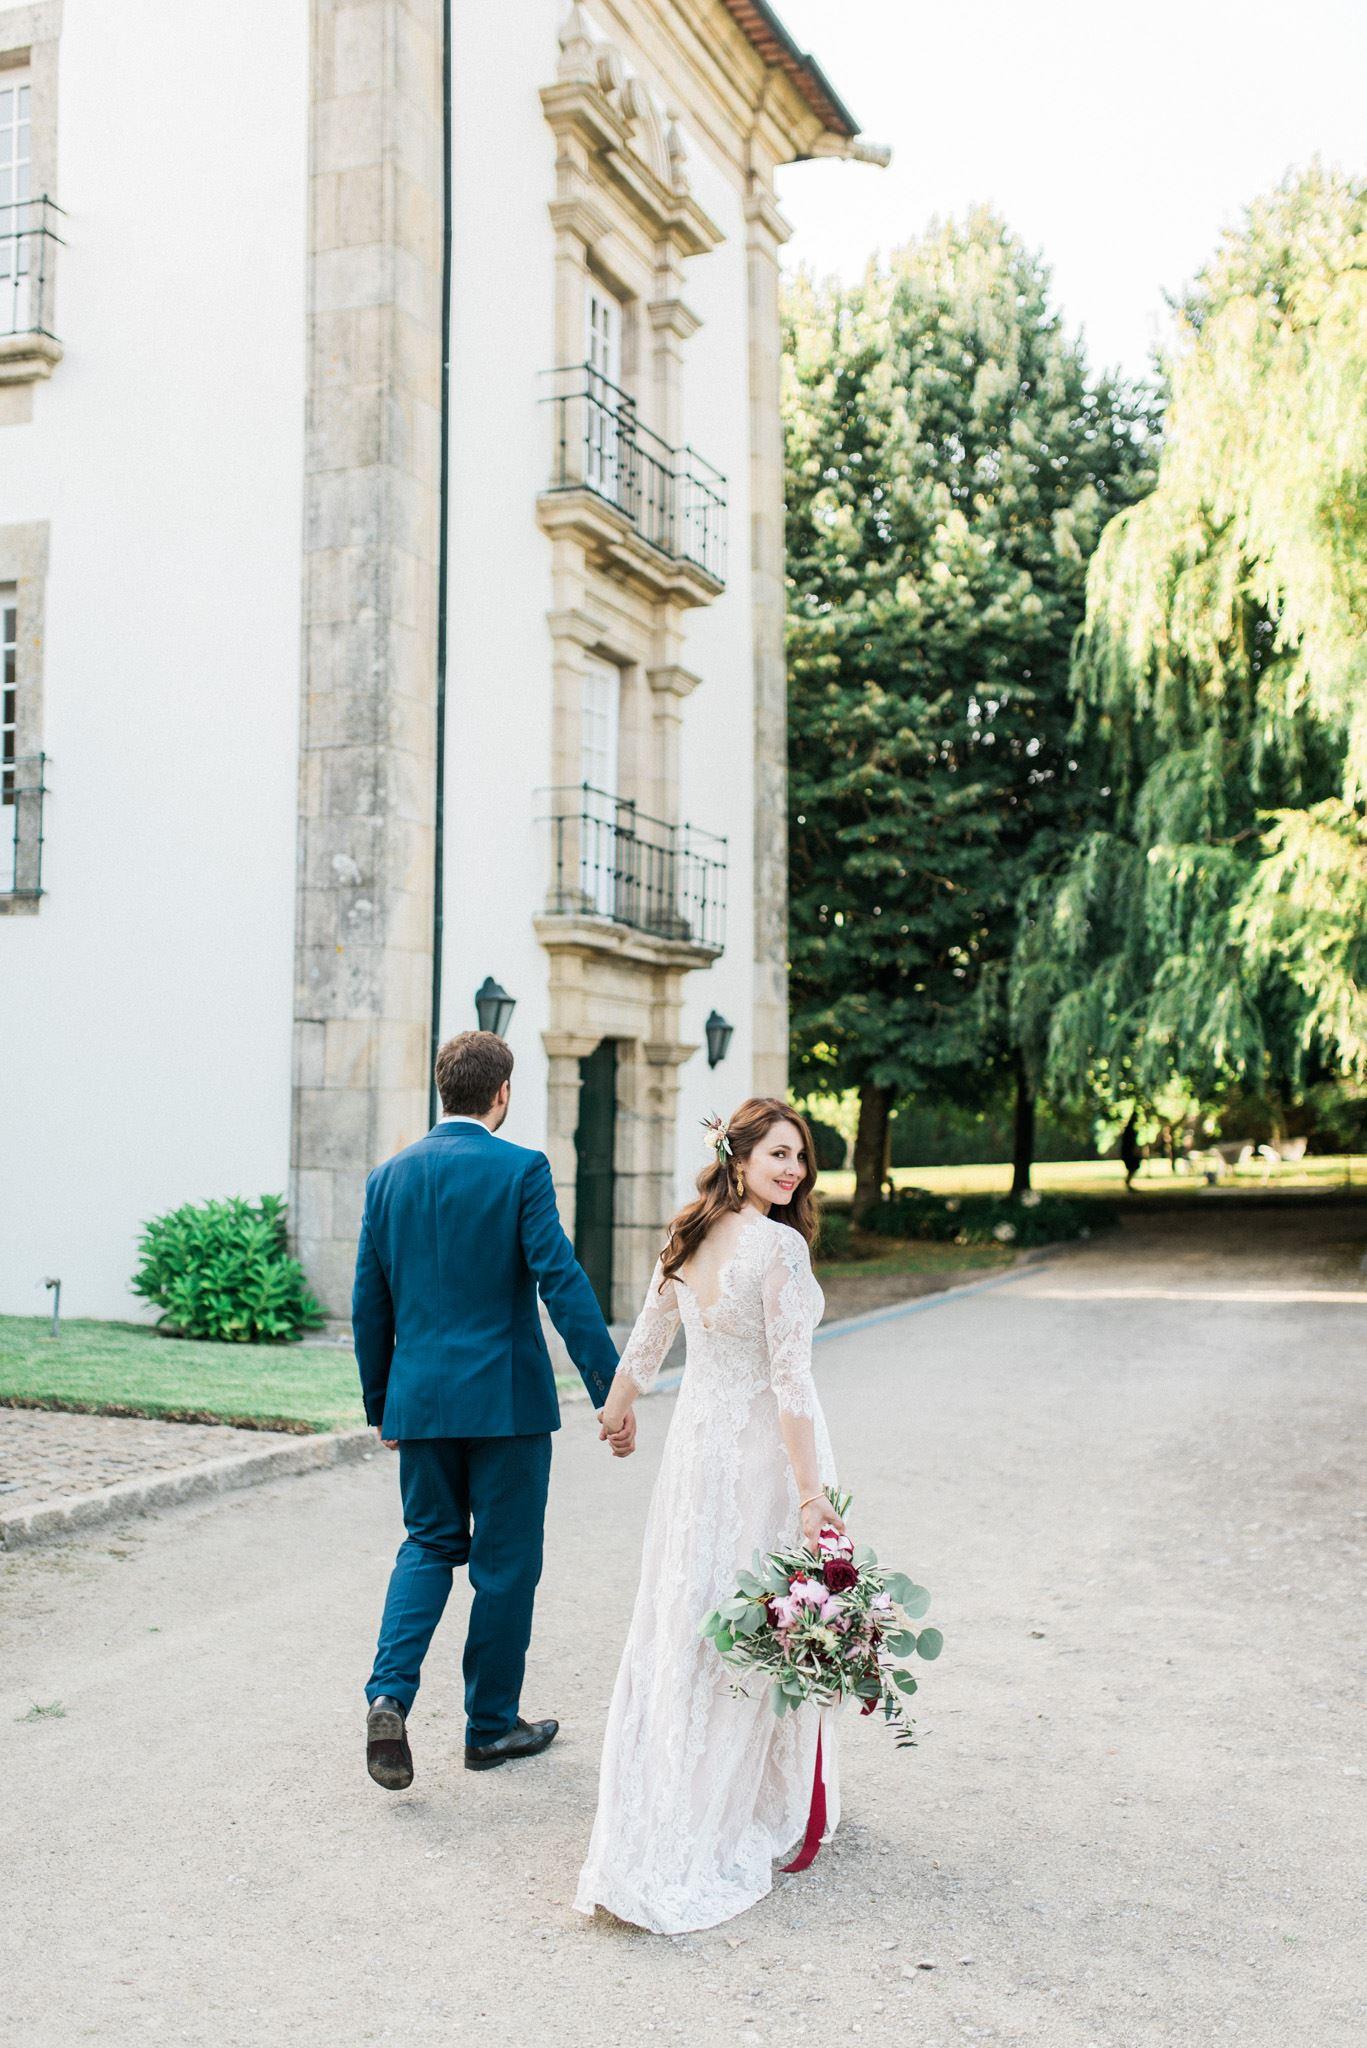 cassandra on her wedding day